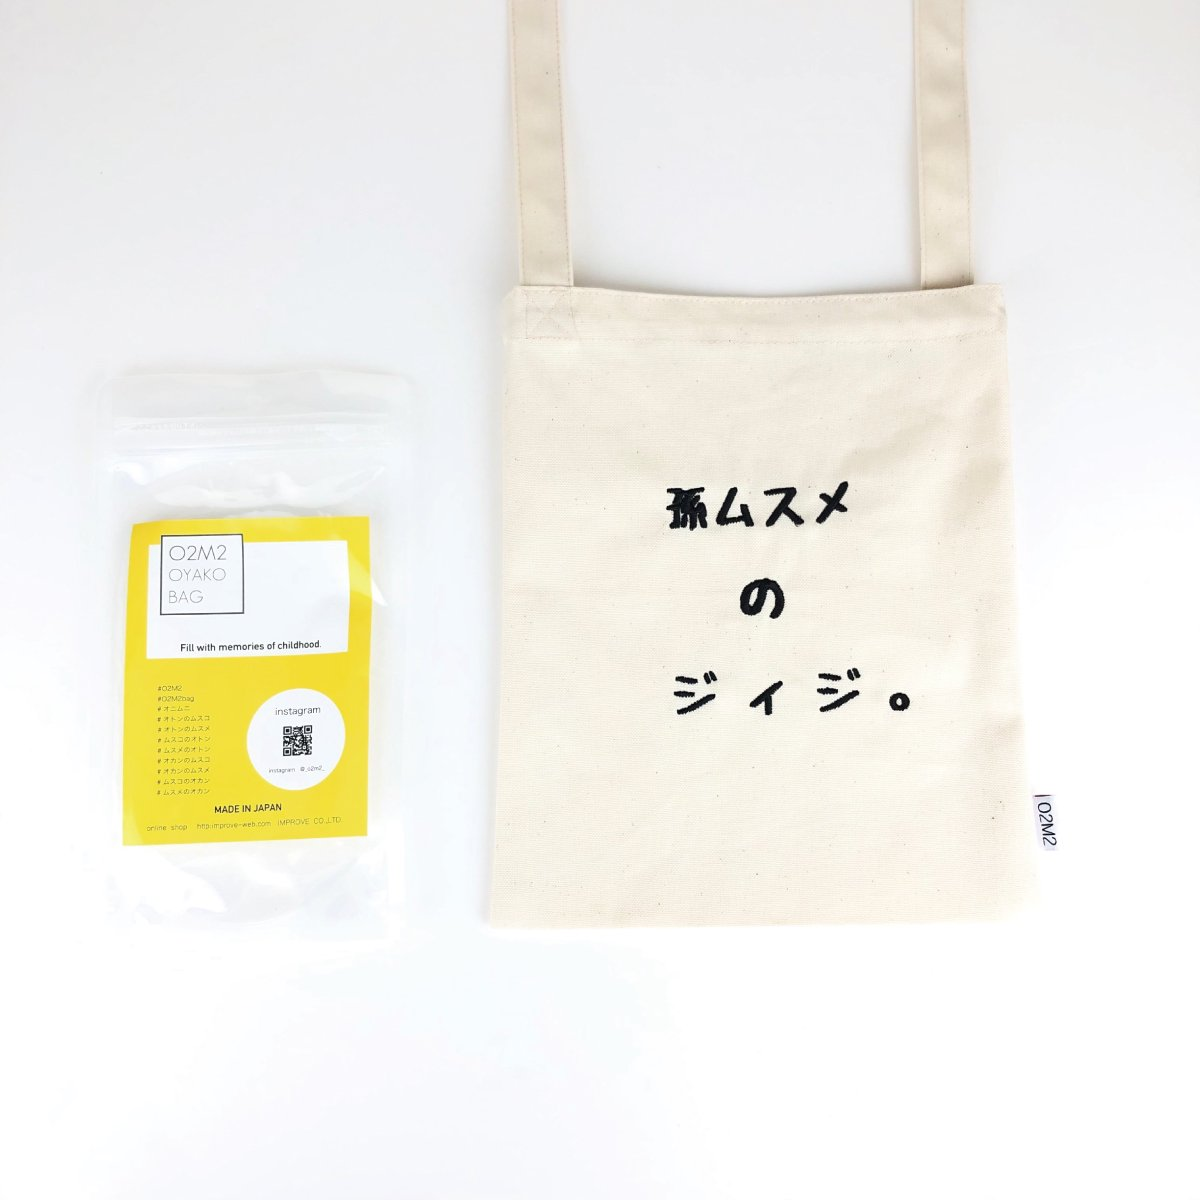 Cotton HF Sacoche(孫・ジィジ&バァバシリーズ) 詳細画像1